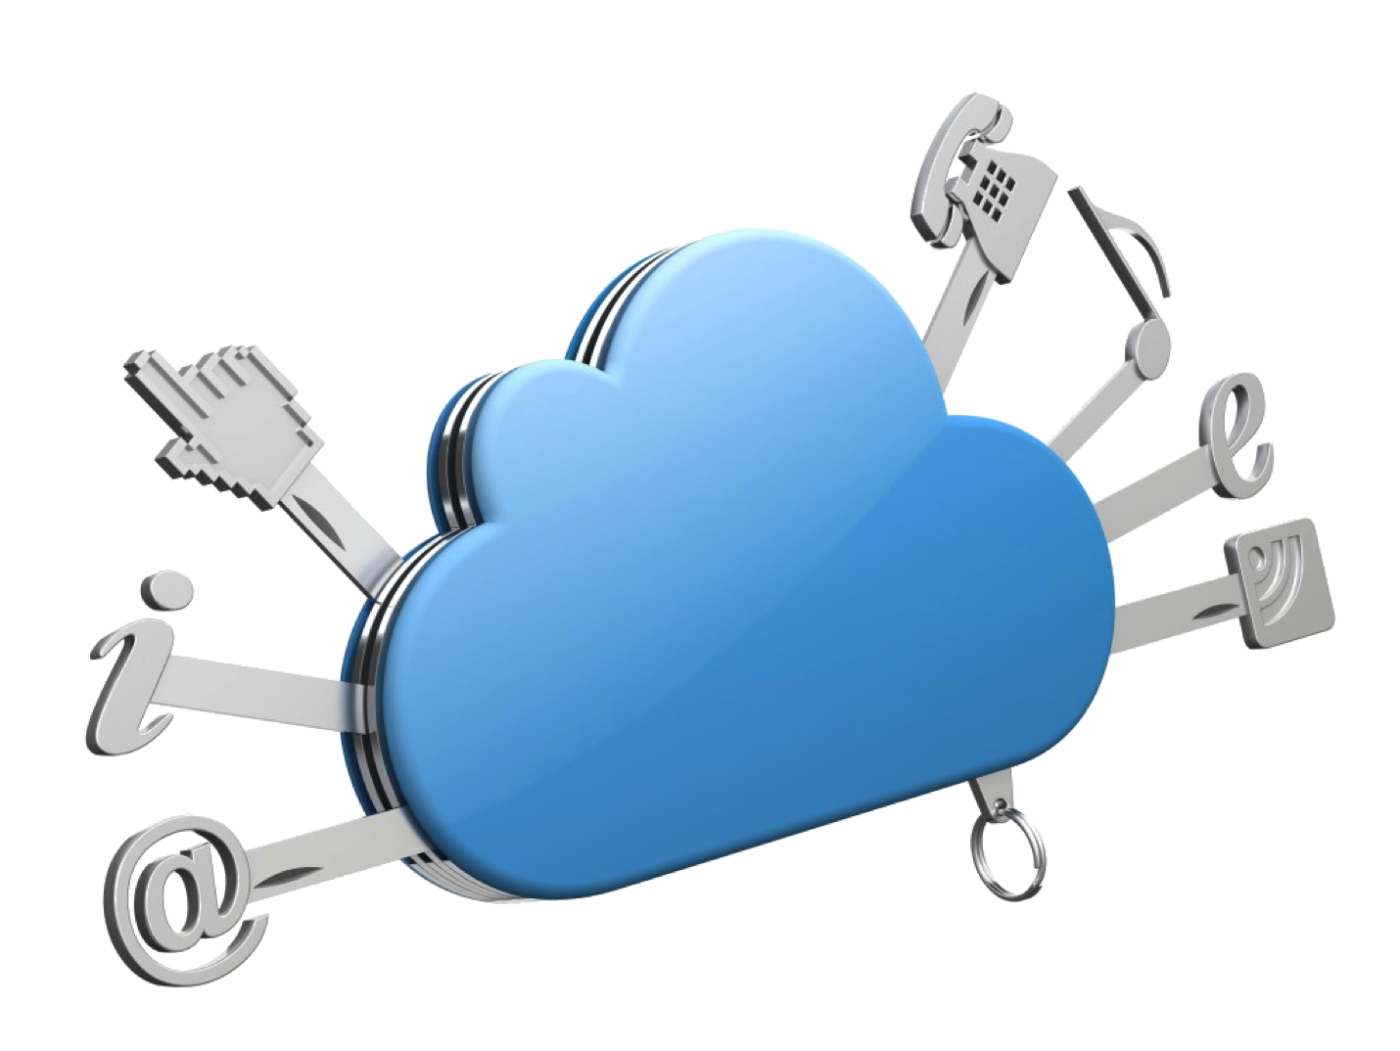 Security advantages and disadvantages. Clouds clipart cloud computing